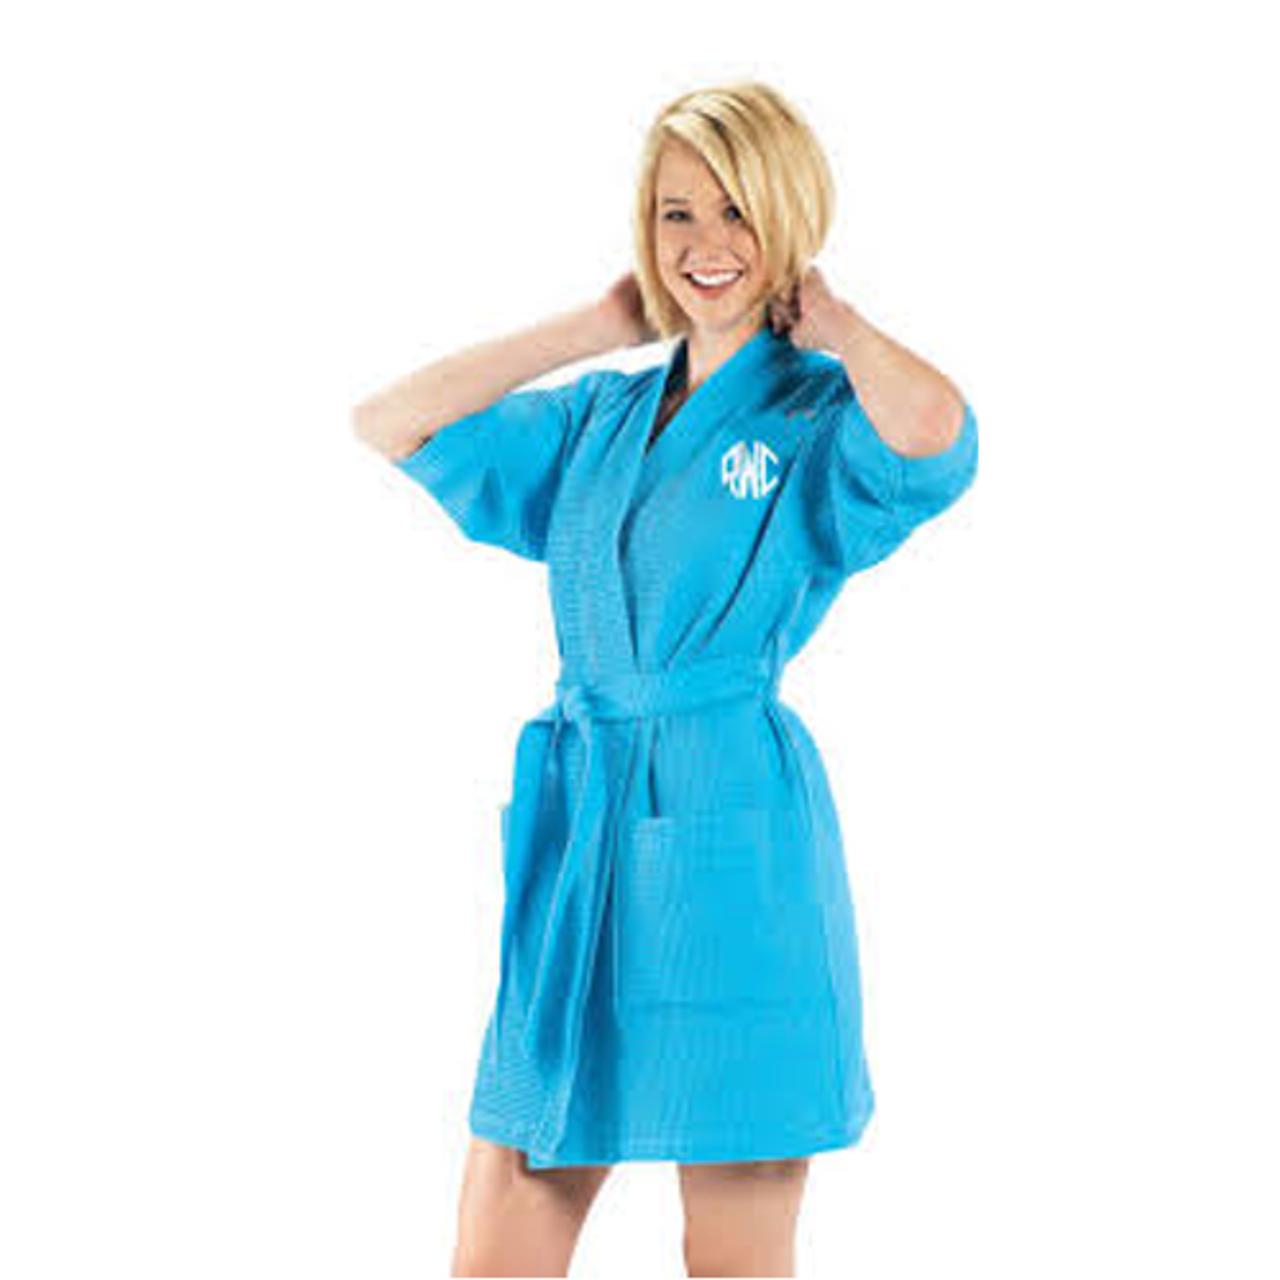 880b83b5a2 Personalized Waffle Weave Spa Robe